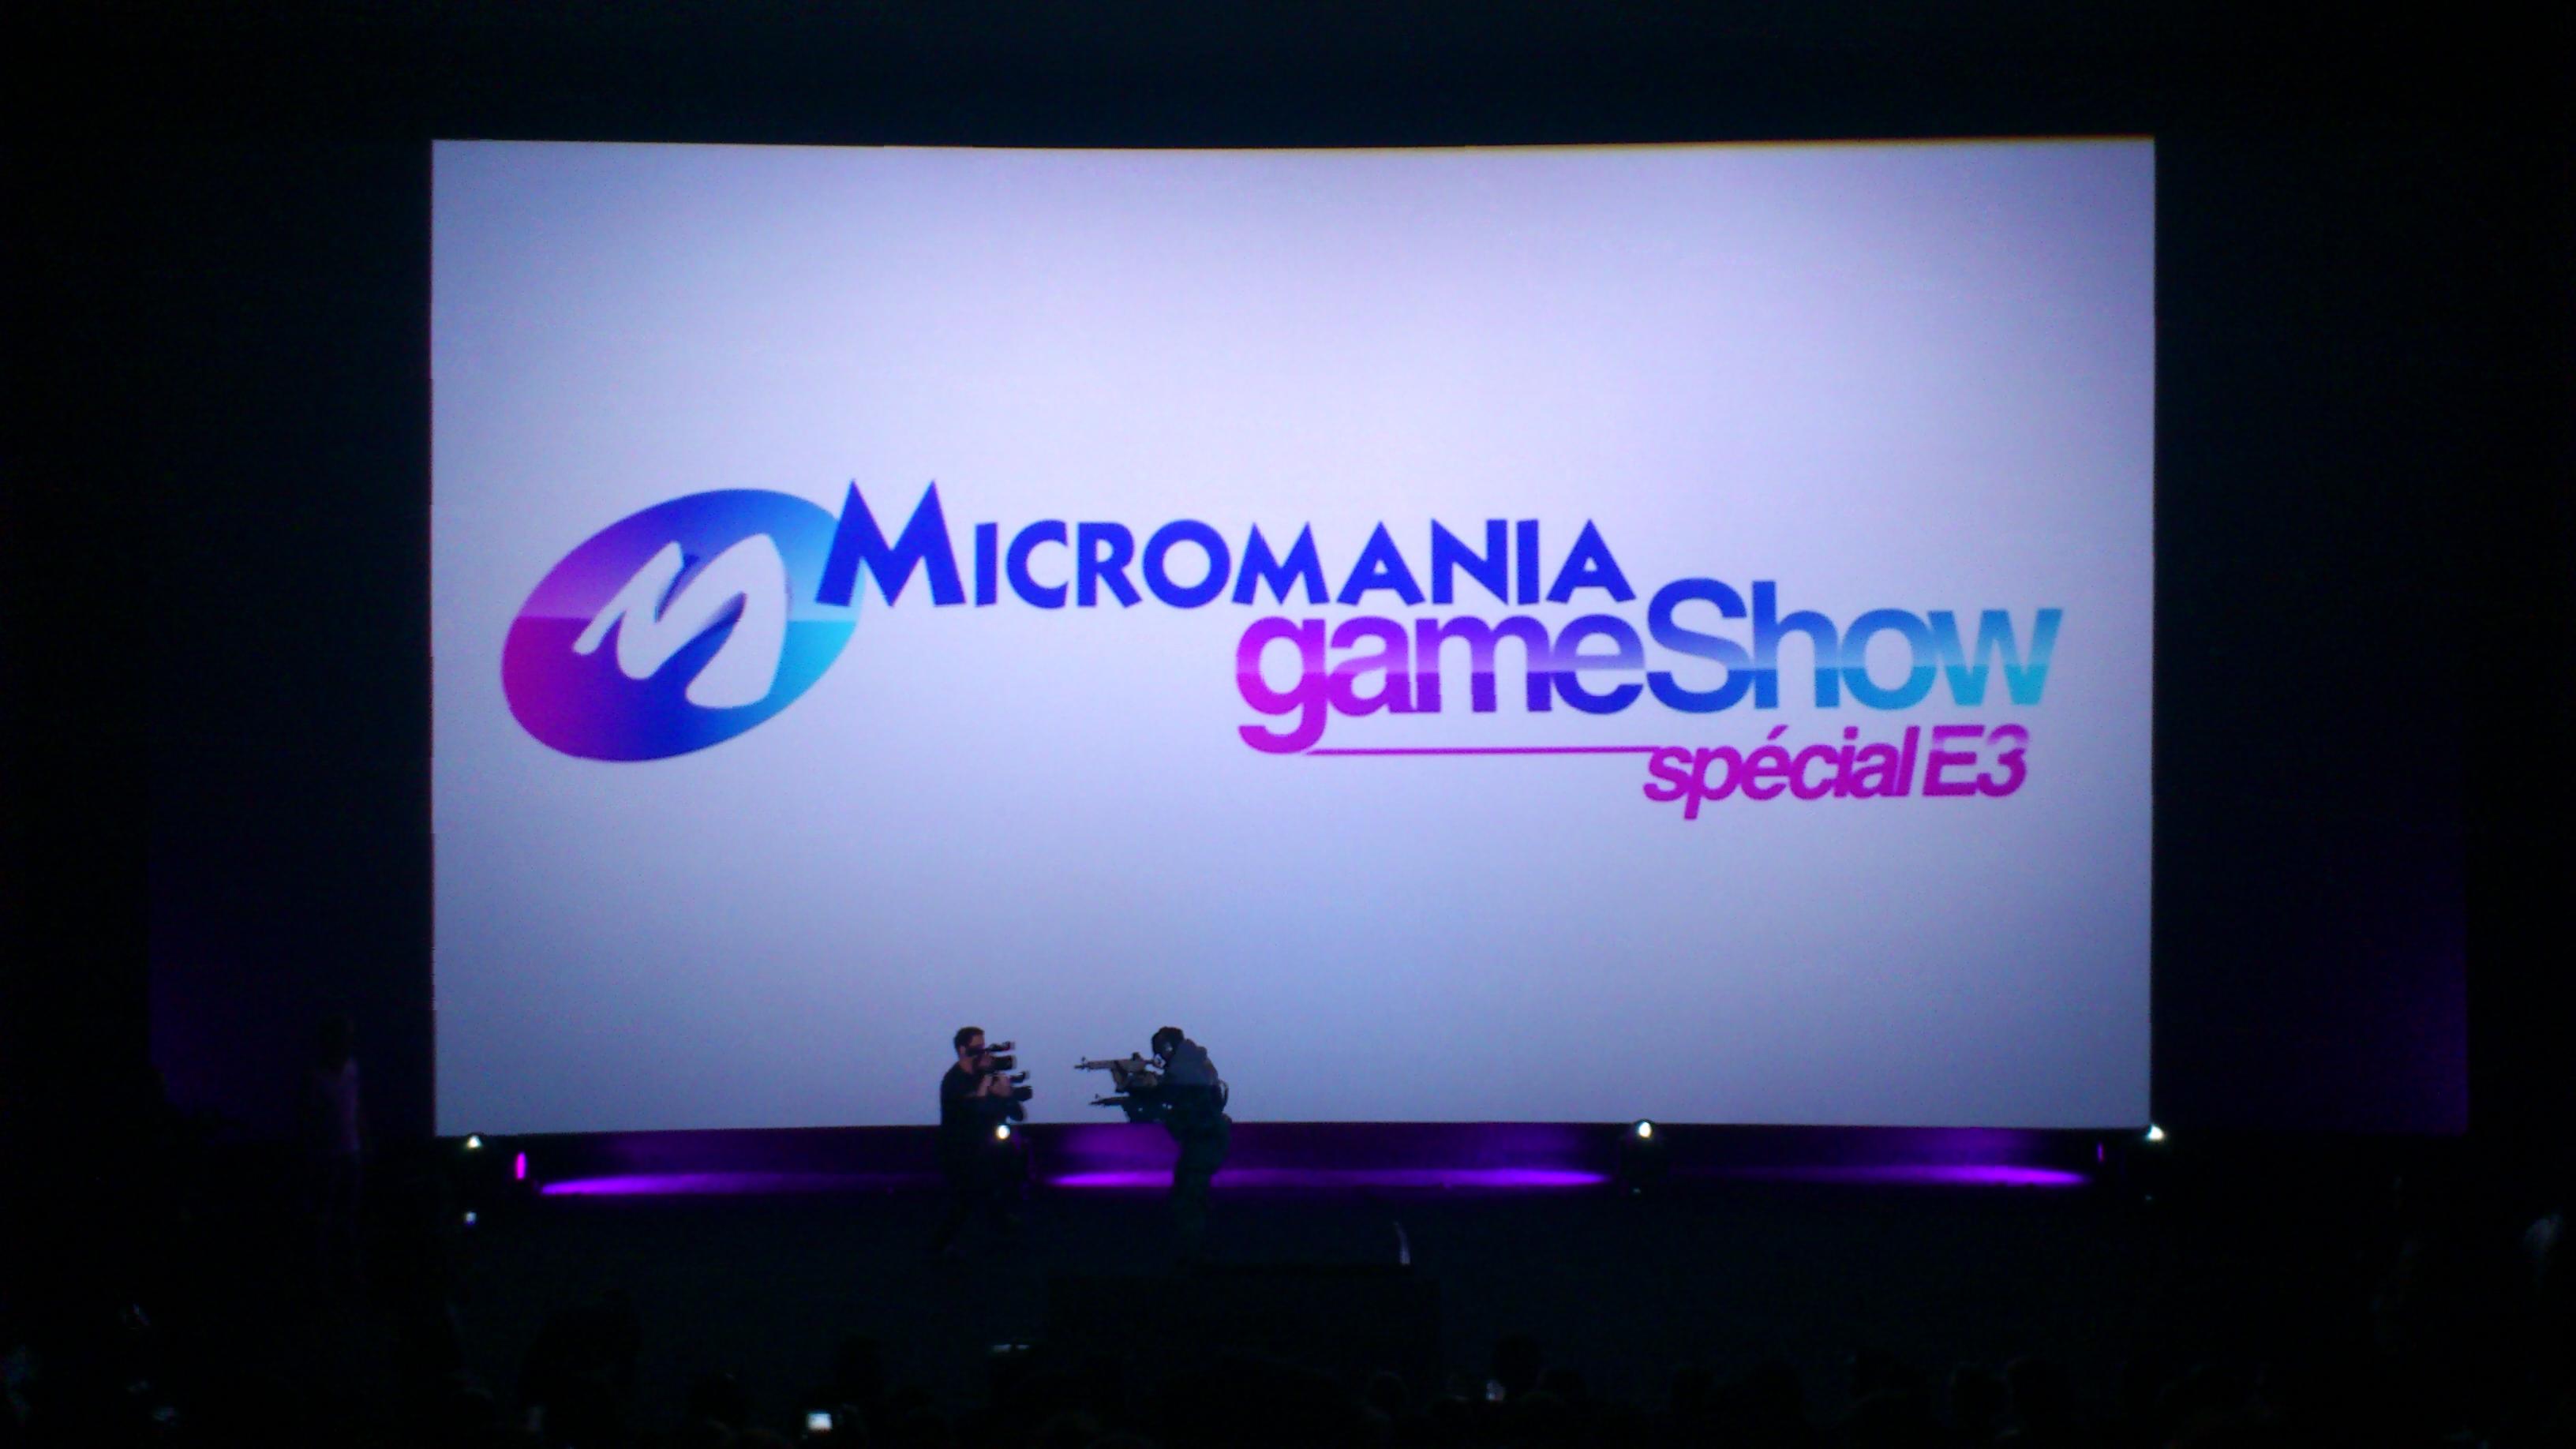 Compte Rendu : Soirée Micromania Game Show spécial E3